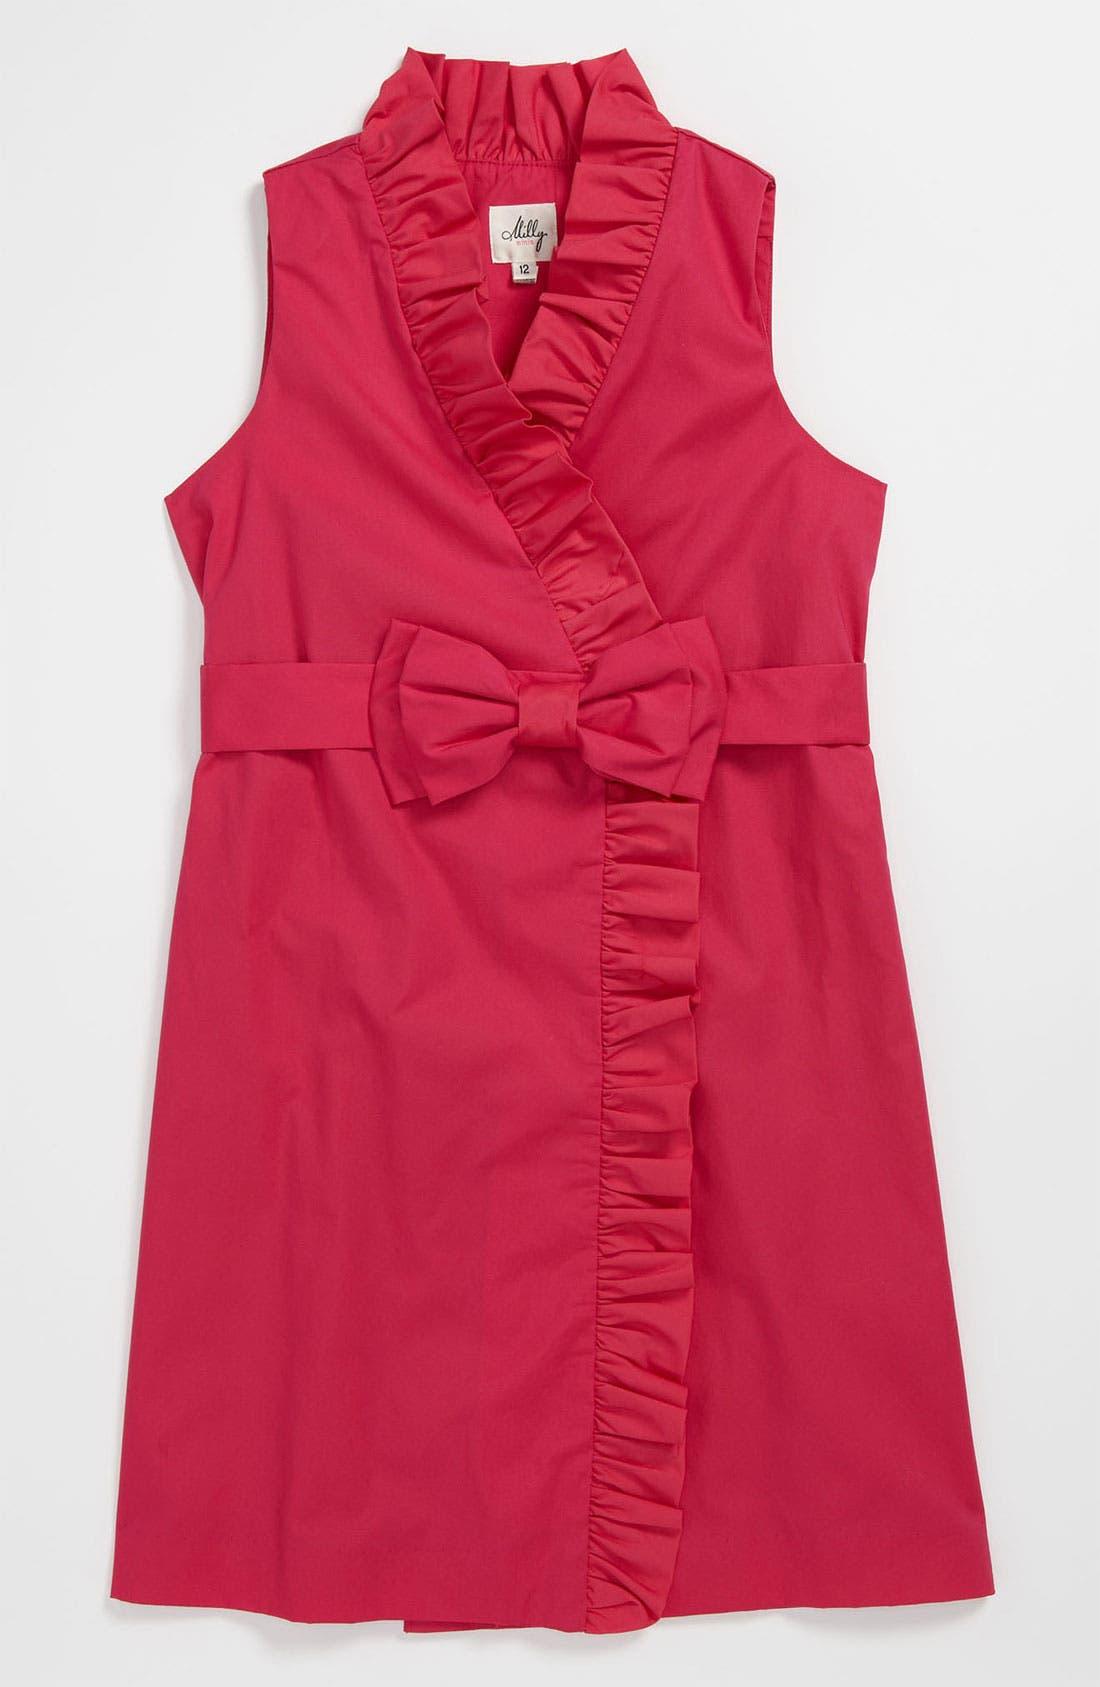 Main Image - Milly Minis Ruffle Wrap Dress (Little Girls & Big Girls)